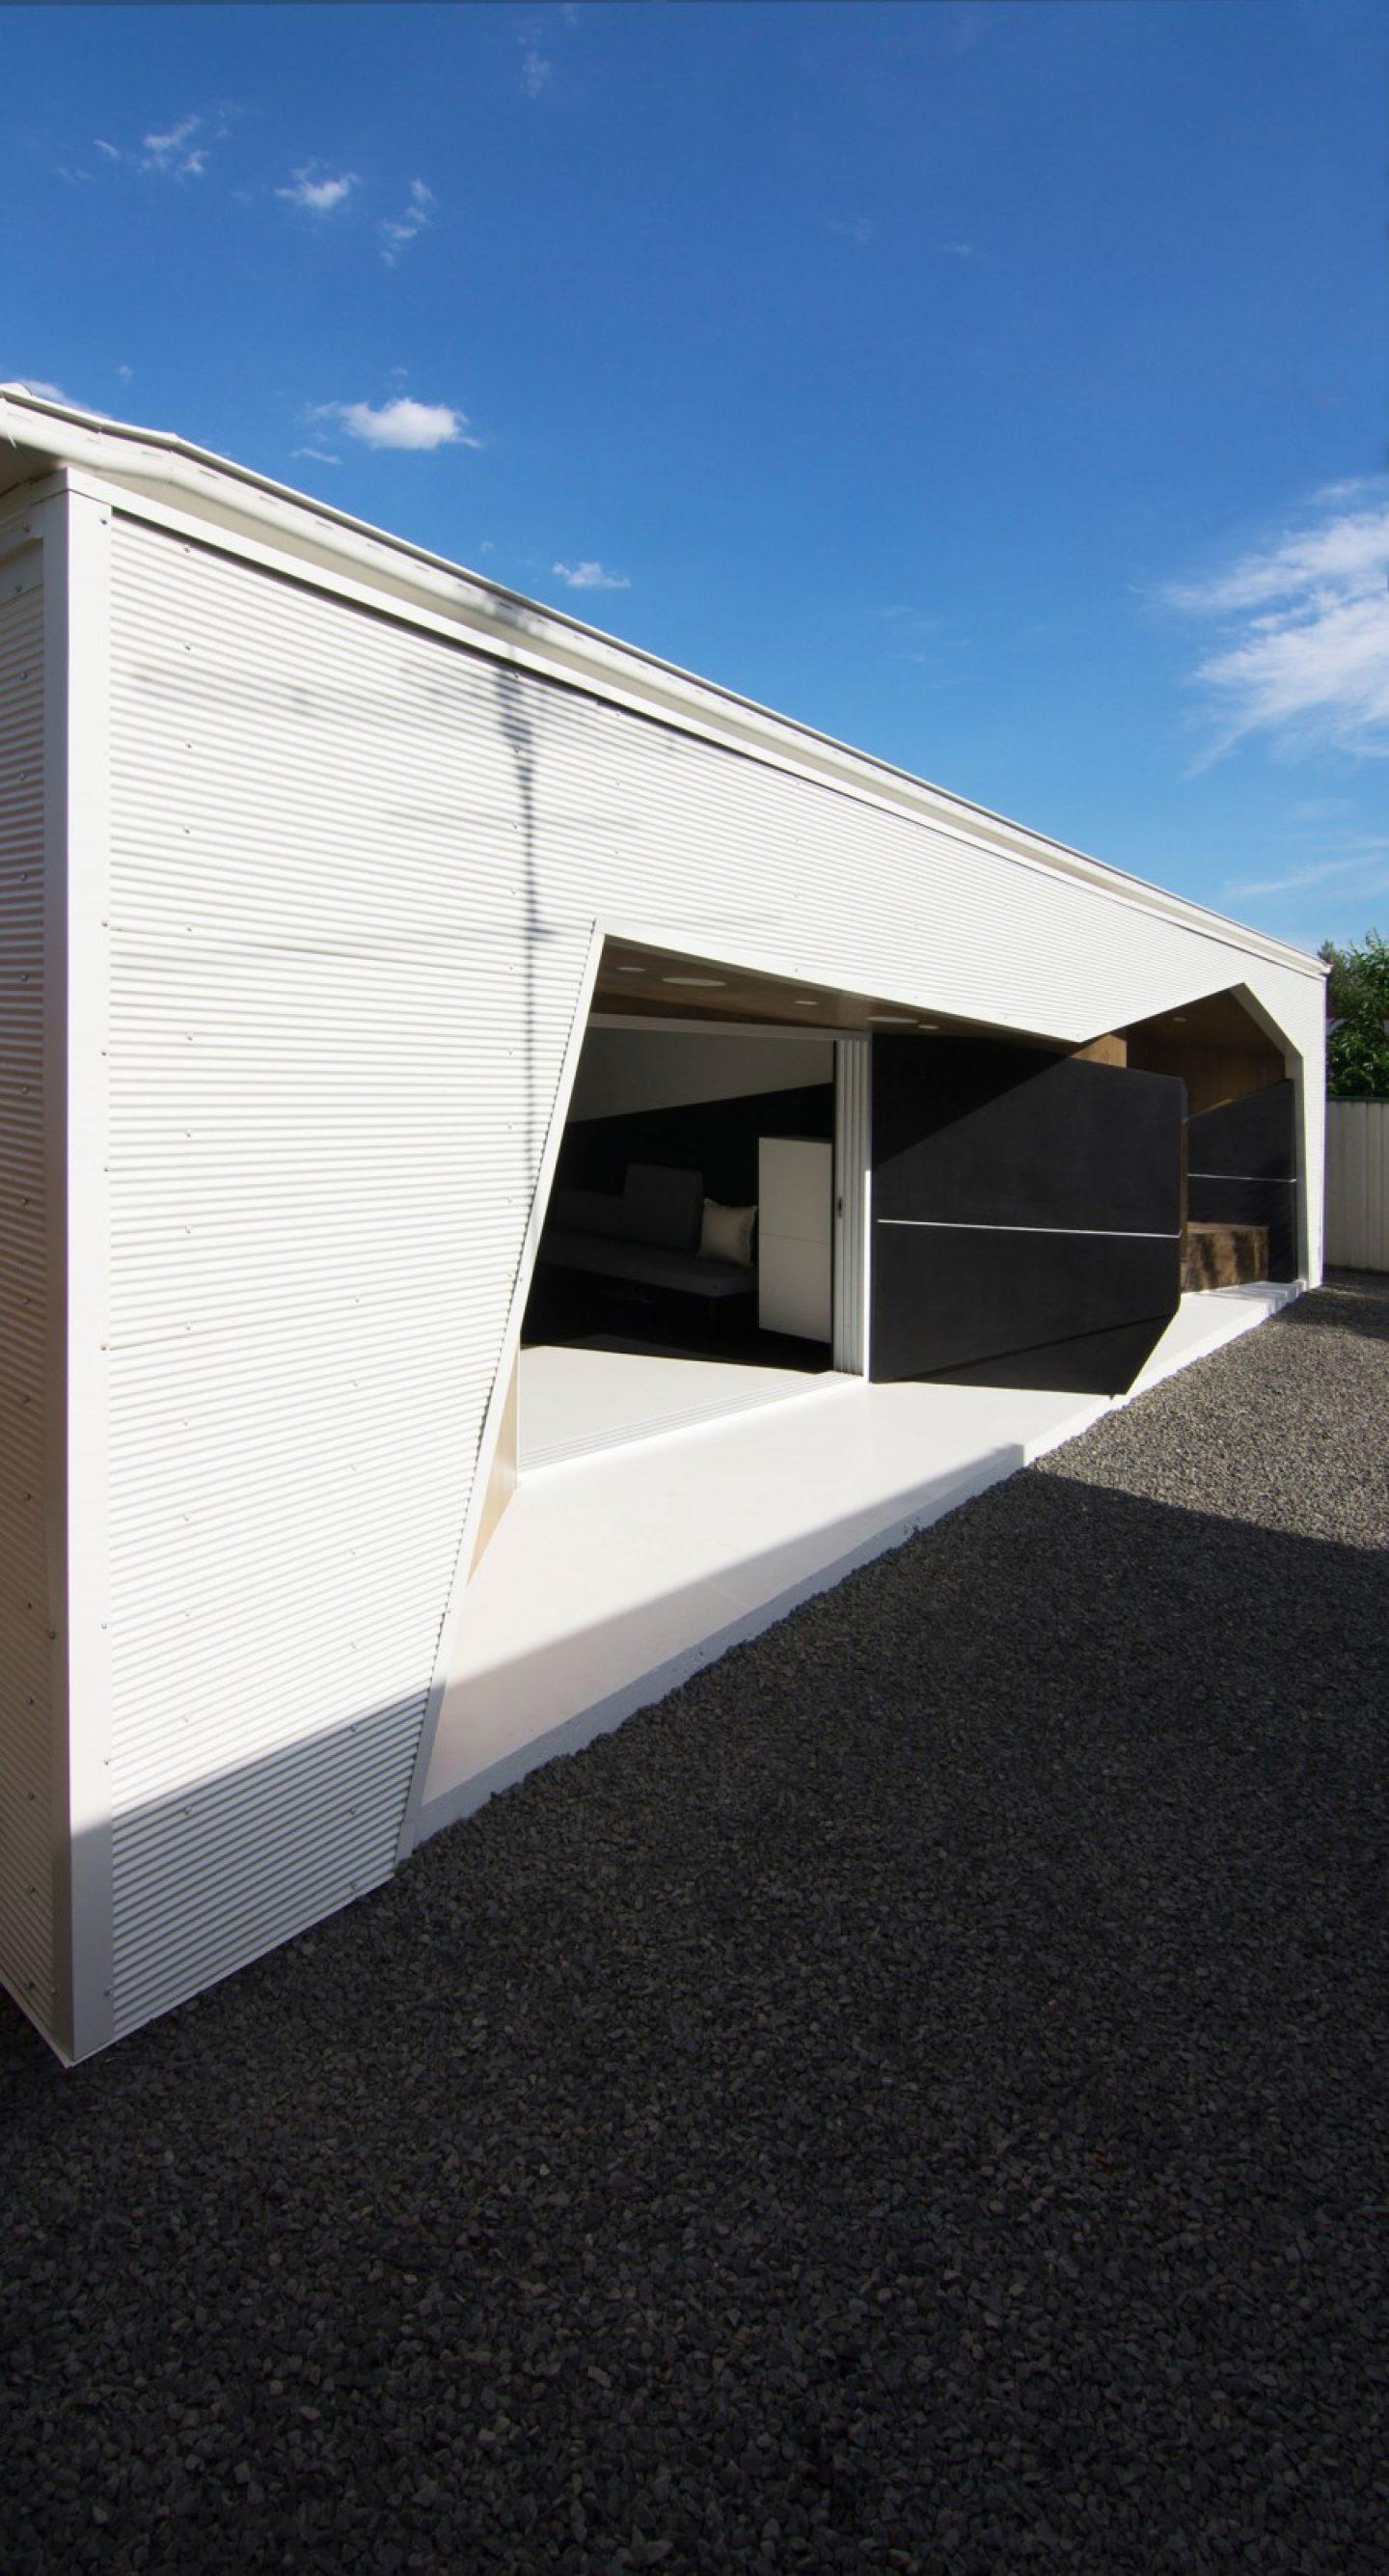 Architecture_House332_GrafikaArchitects_03